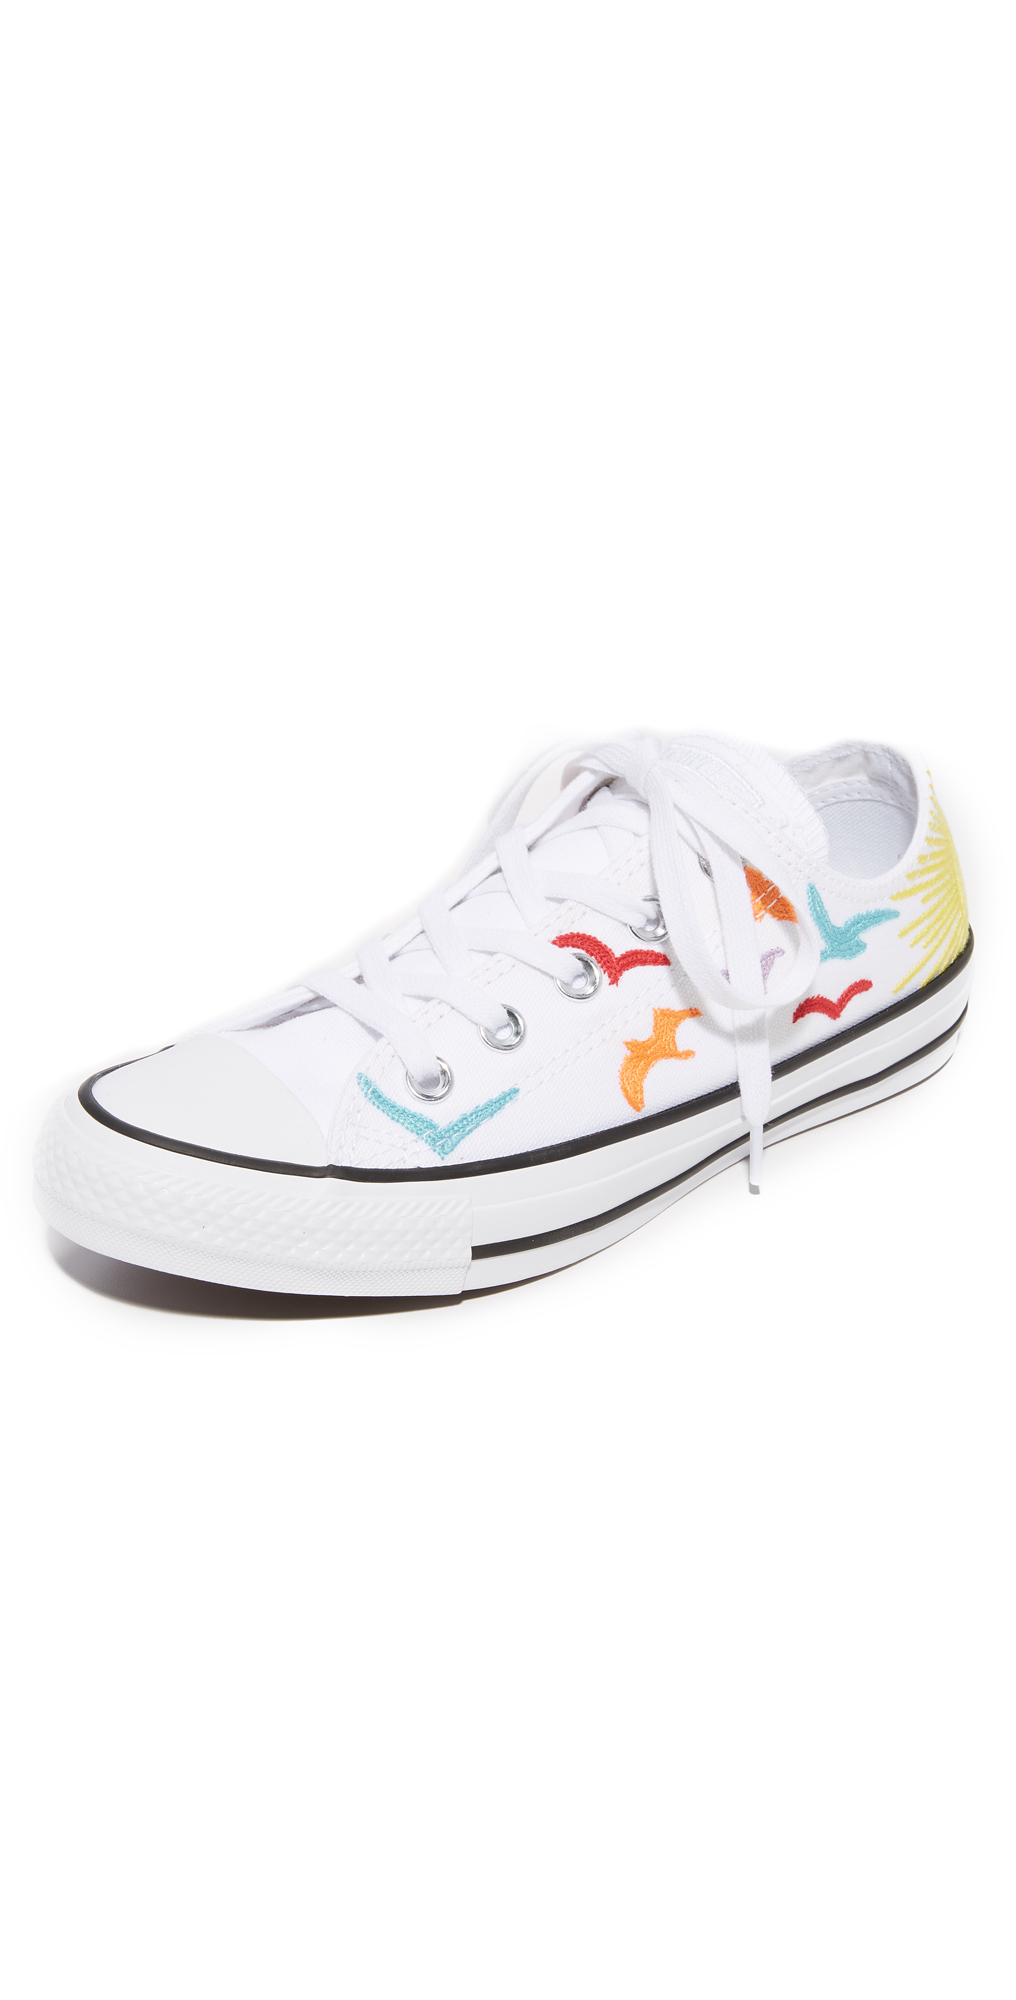 Chuck Taylor All Star x Mara Hoffman OX Sneakers Converse